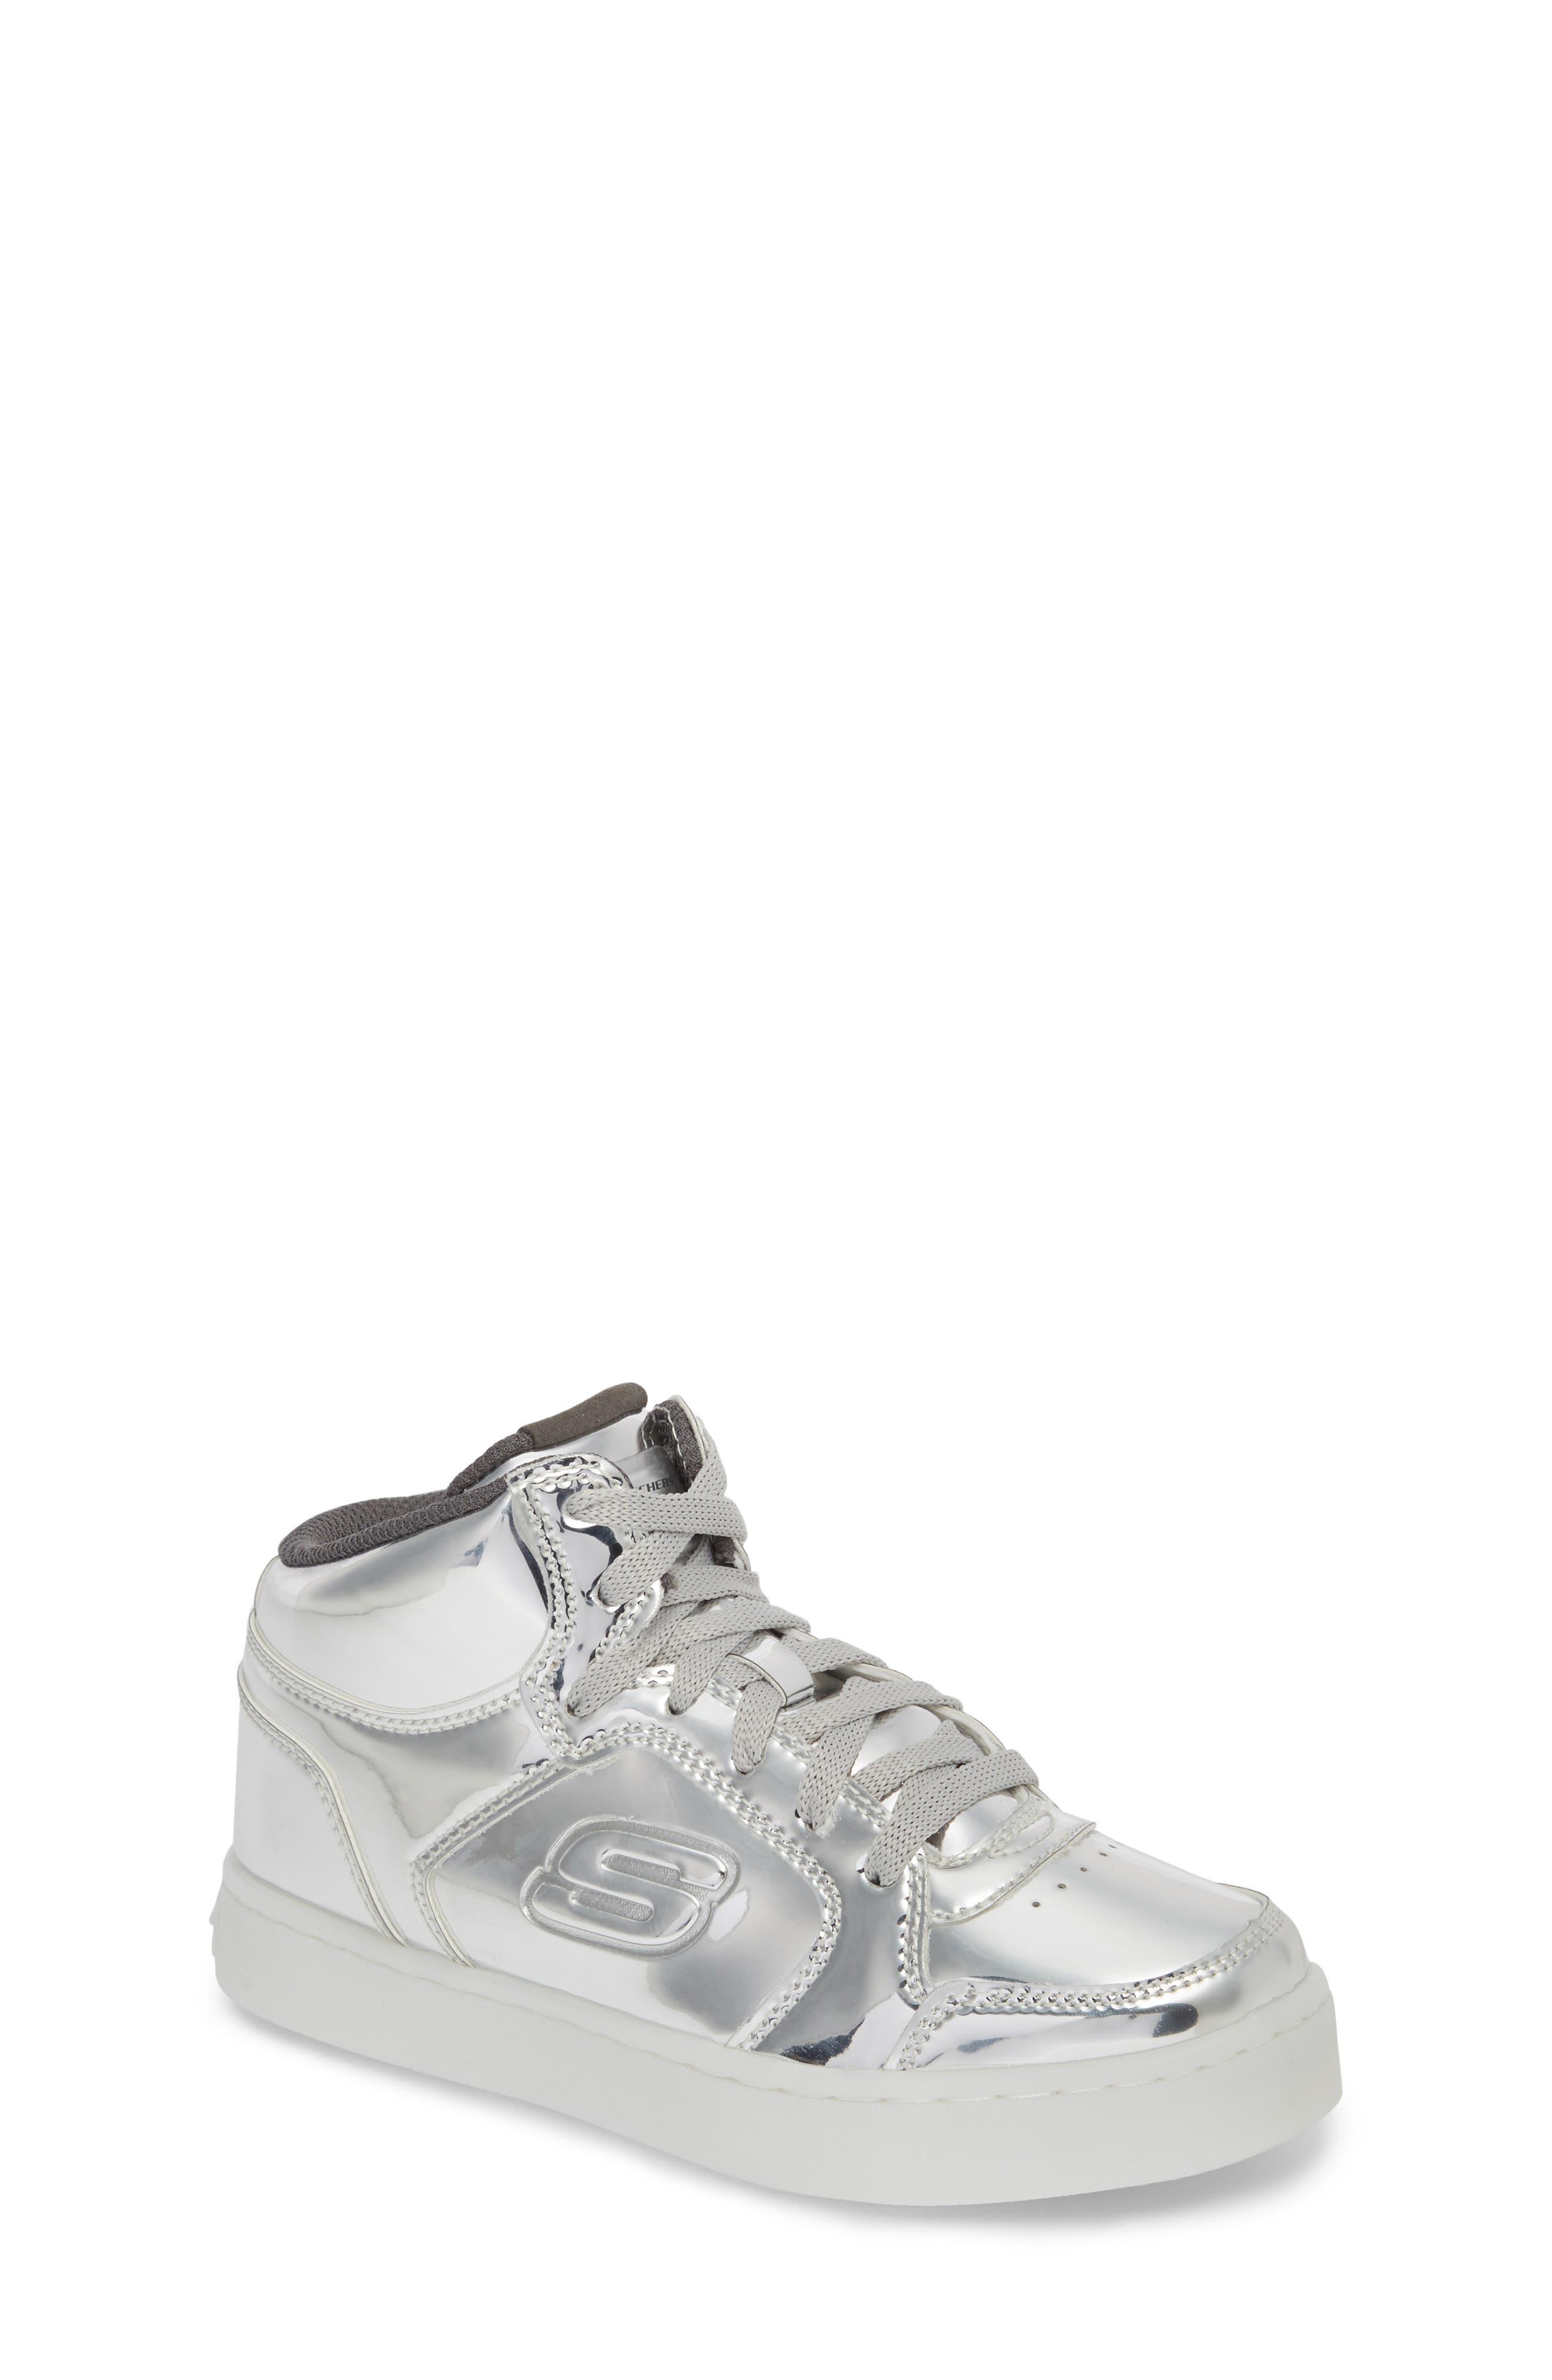 Energy Lights Metallic High Top Sneaker,                             Main thumbnail 2, color,